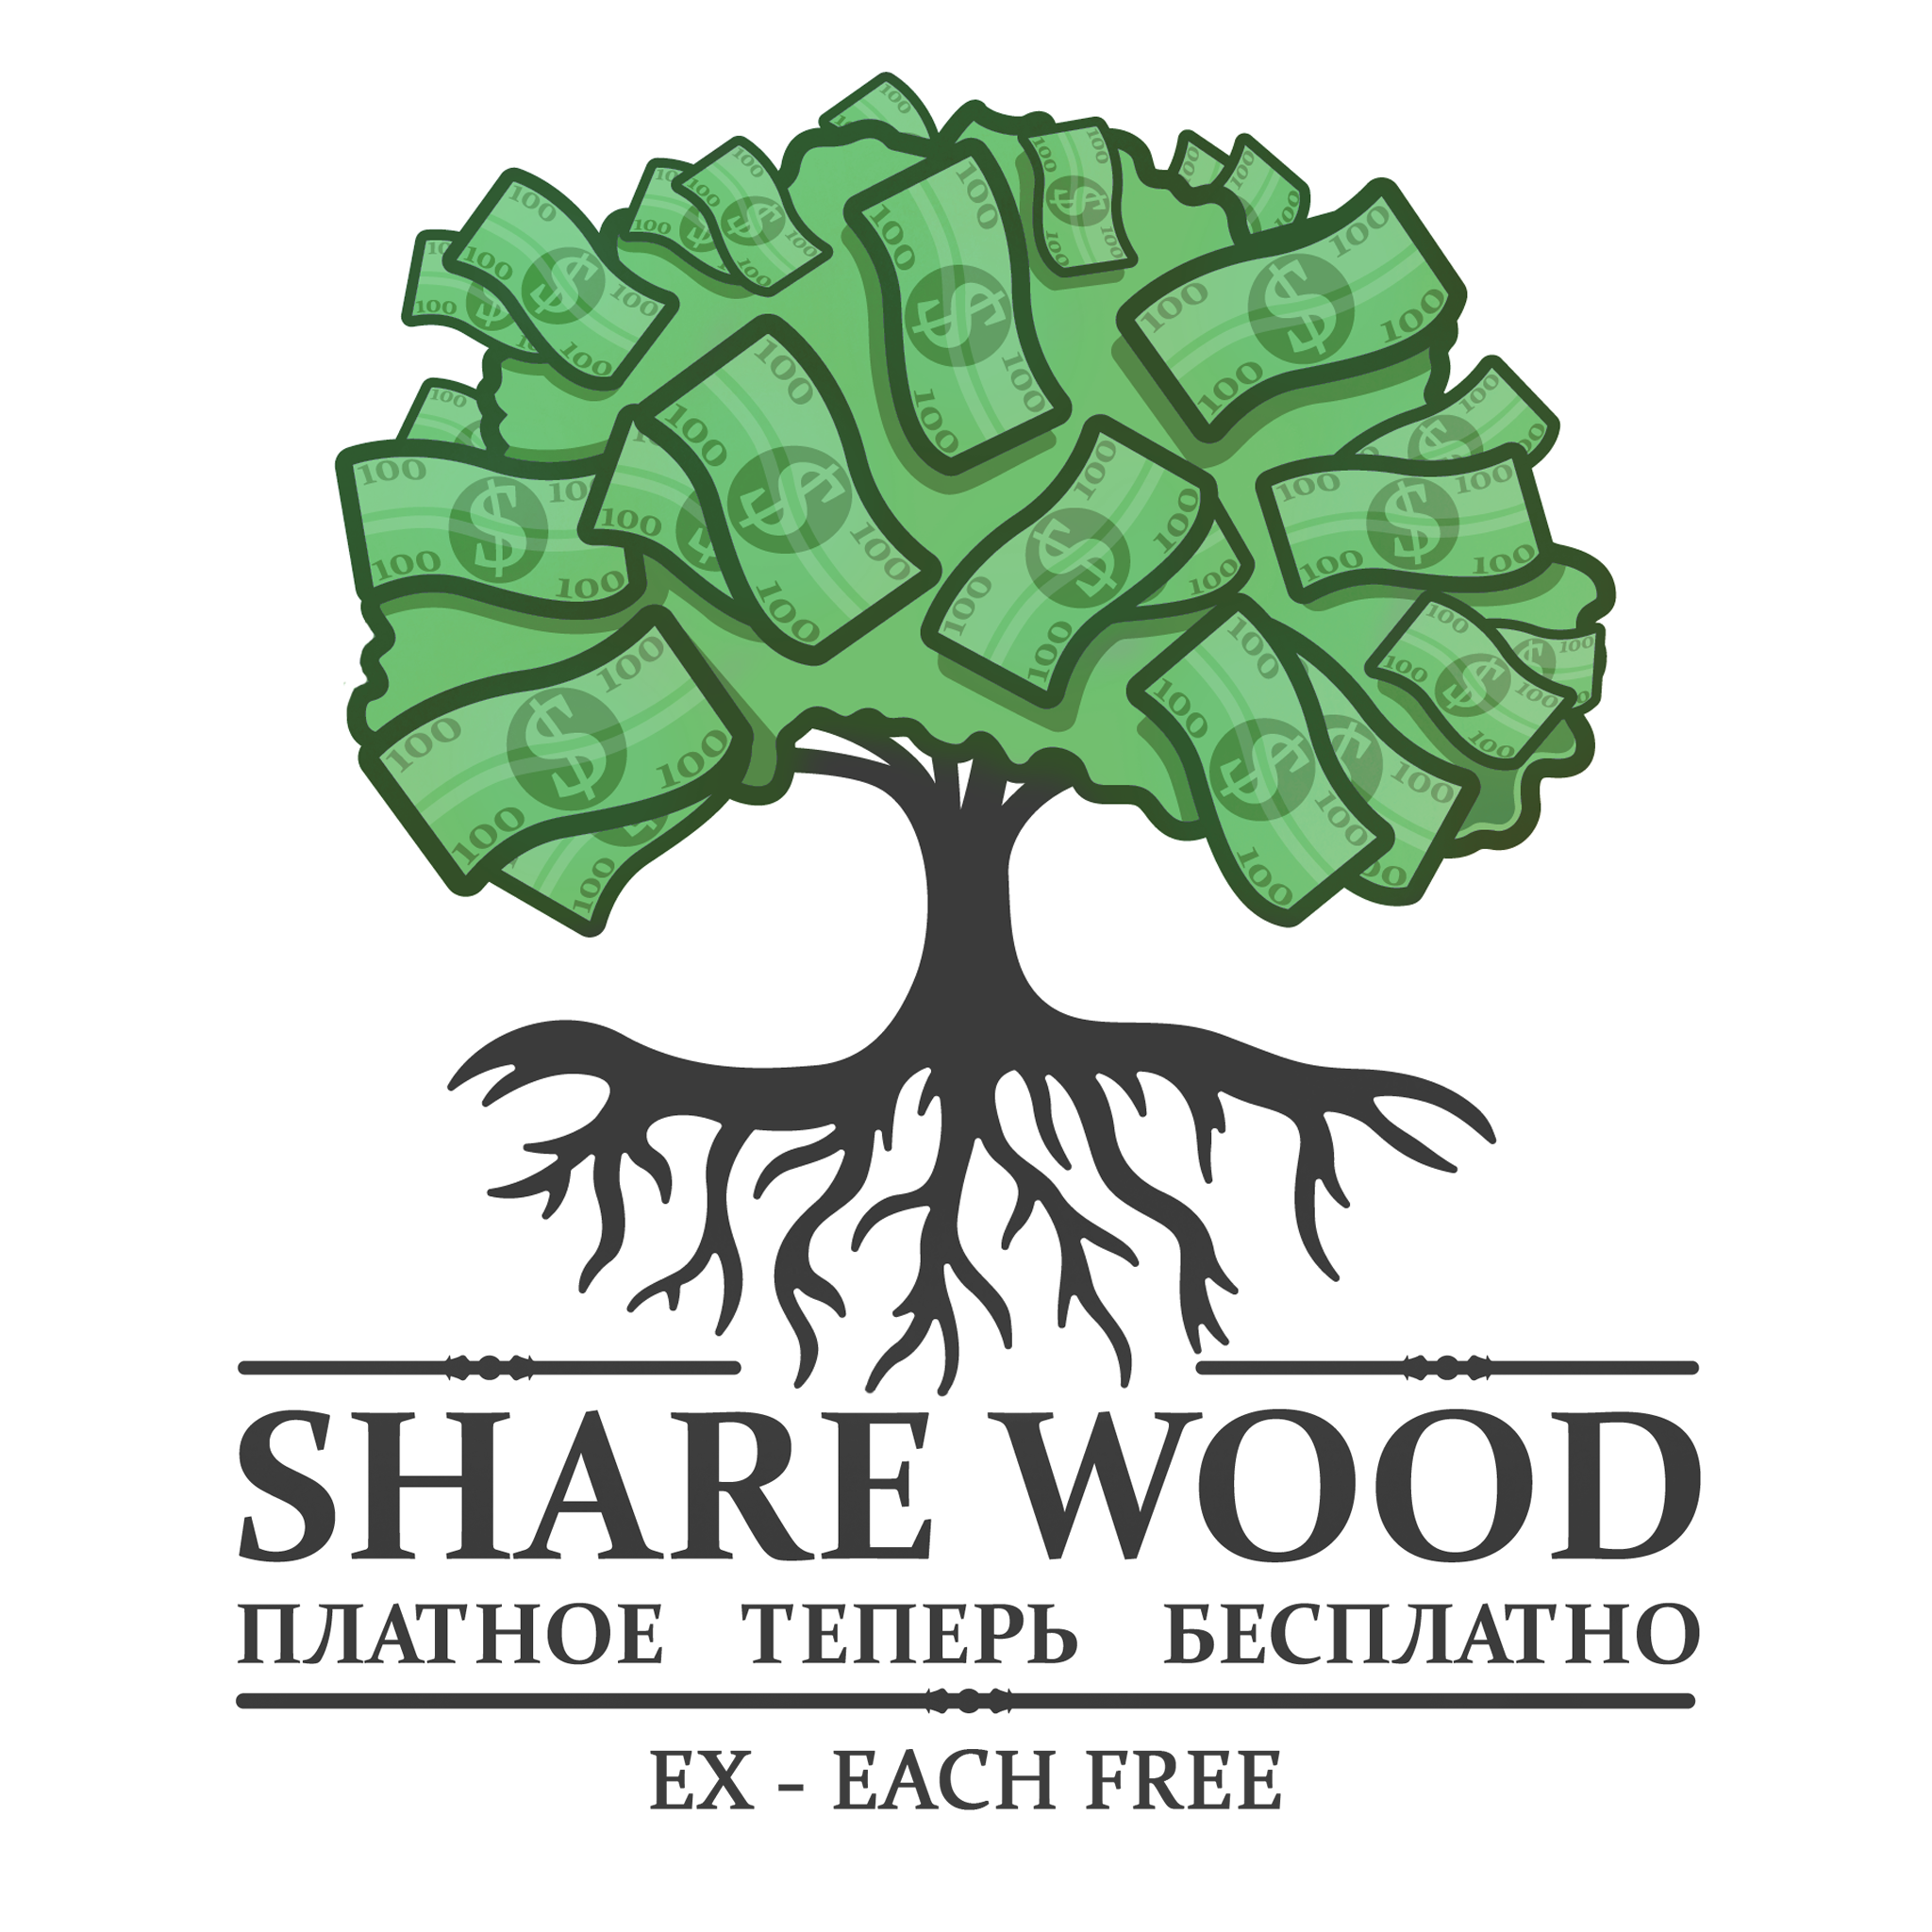 s4.sharewood.ws